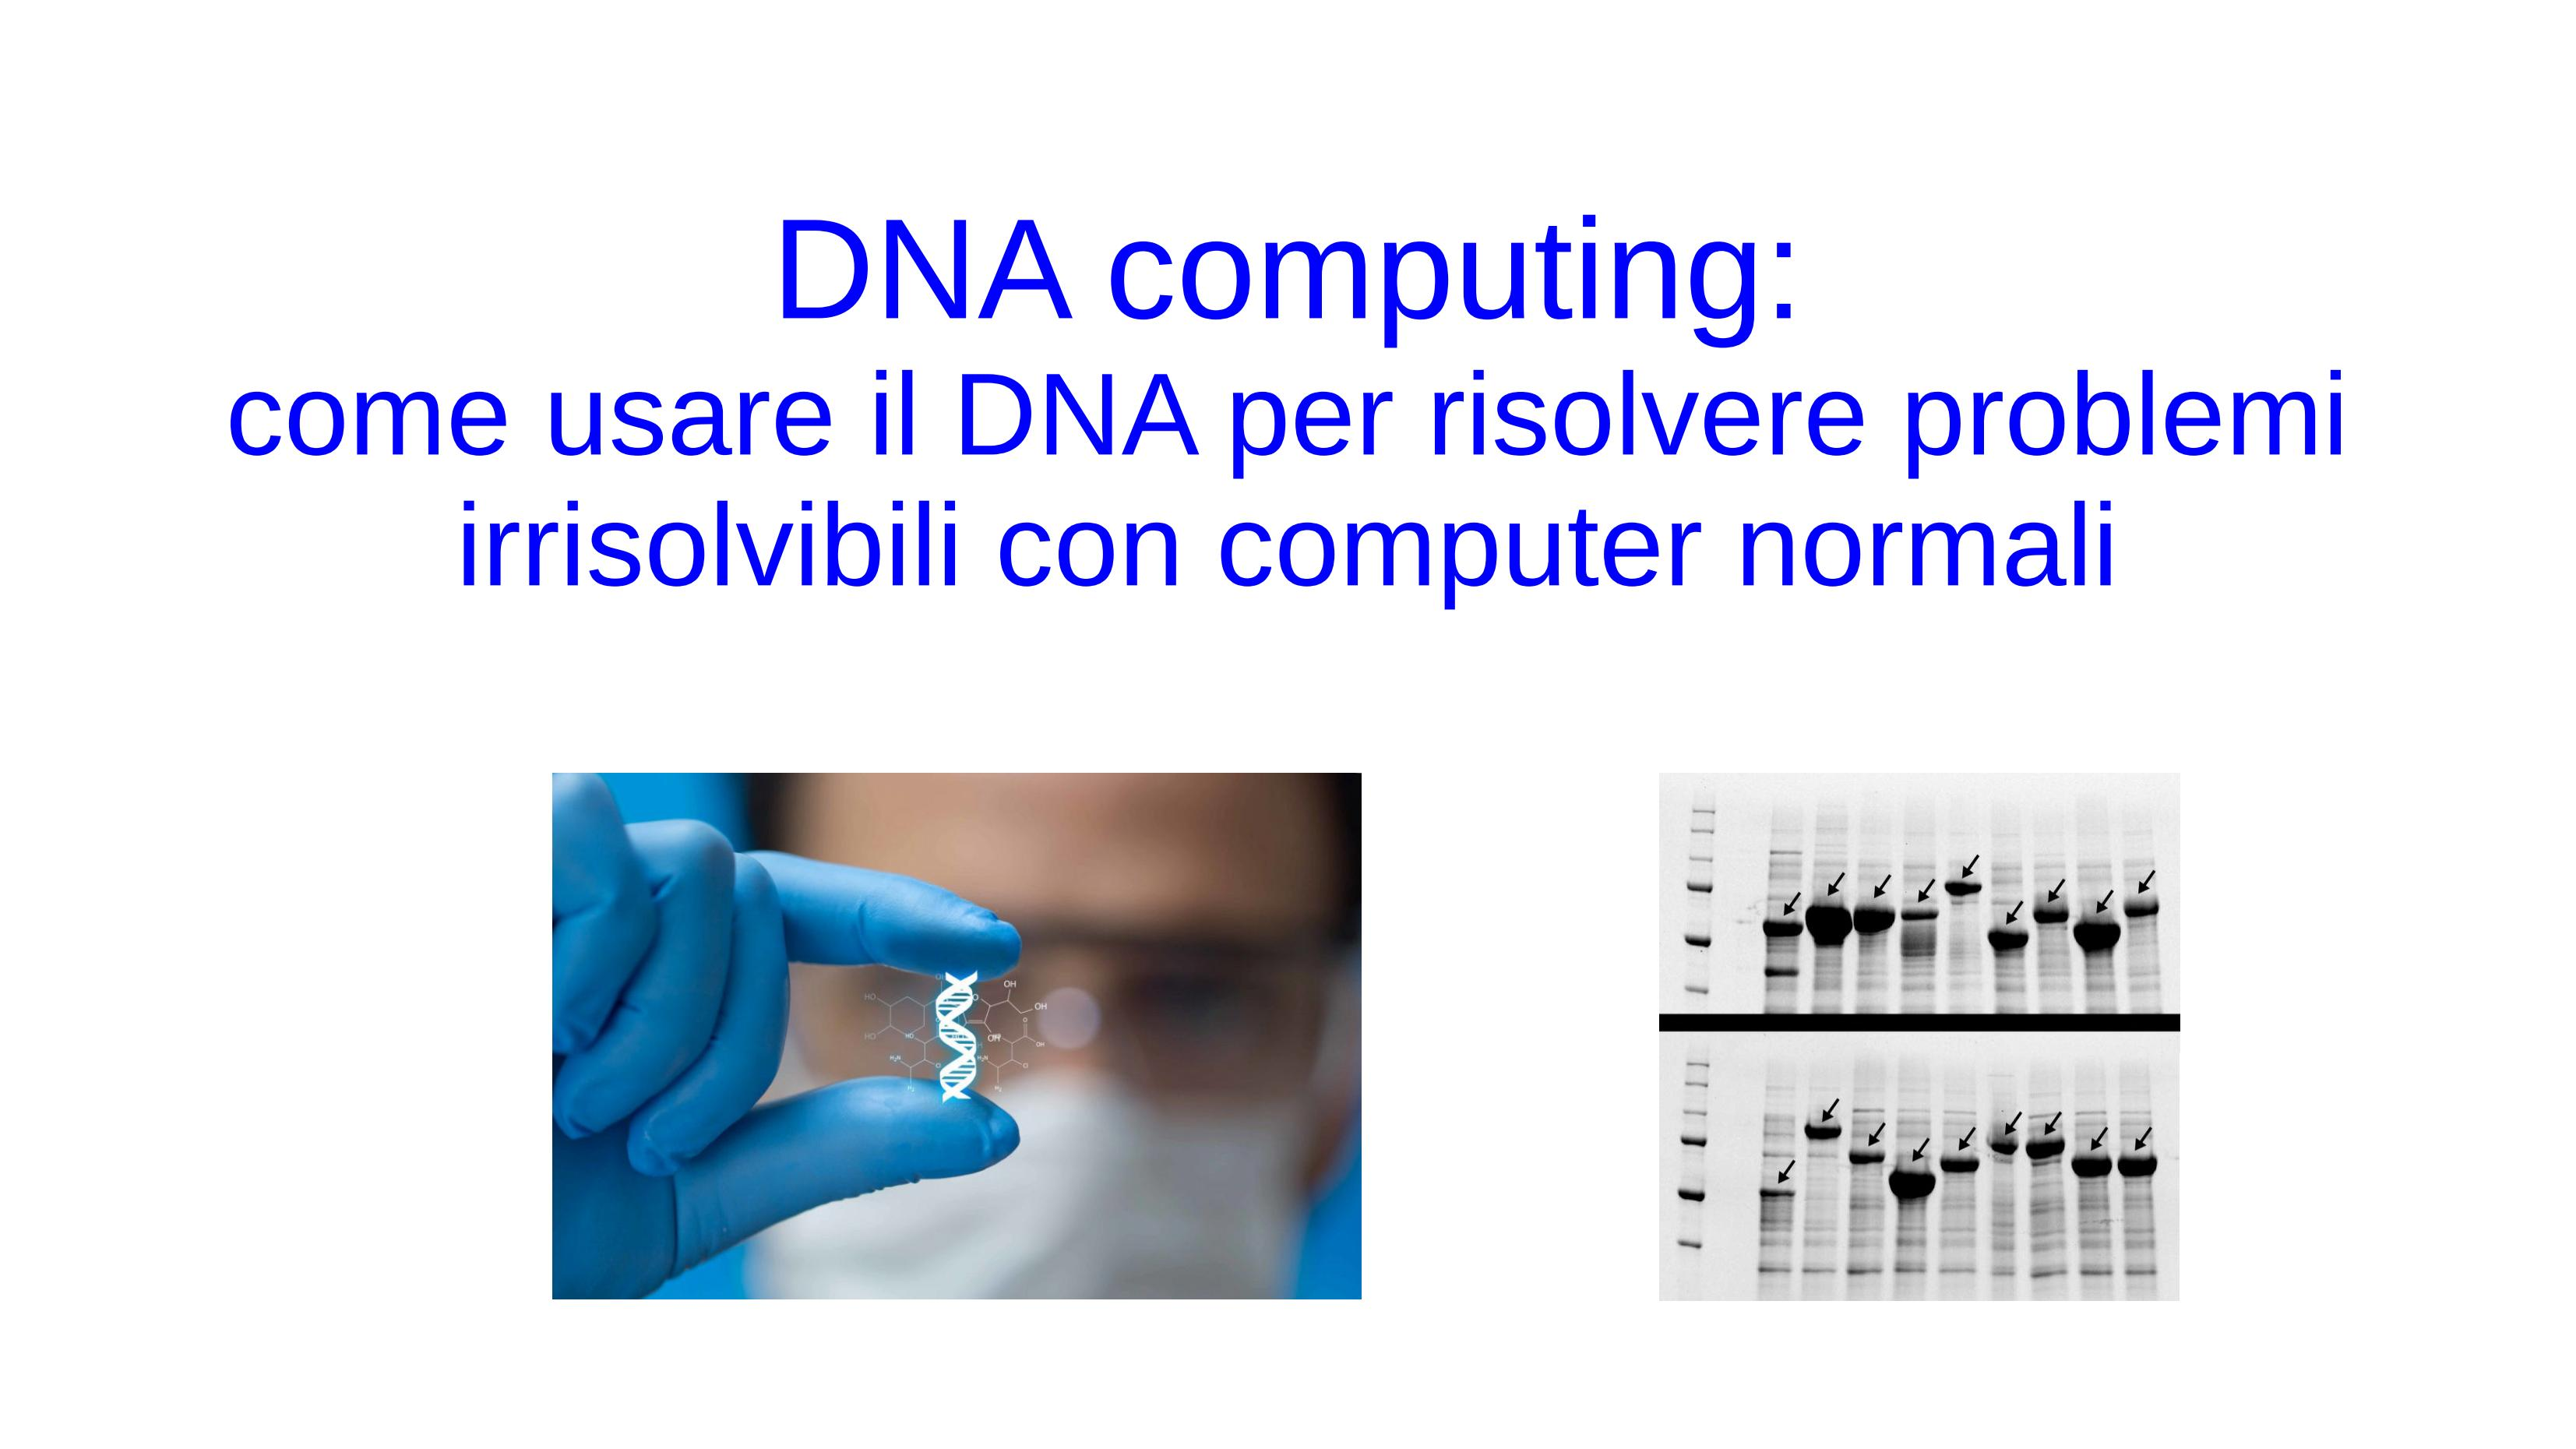 DNA_computing_Lions_01